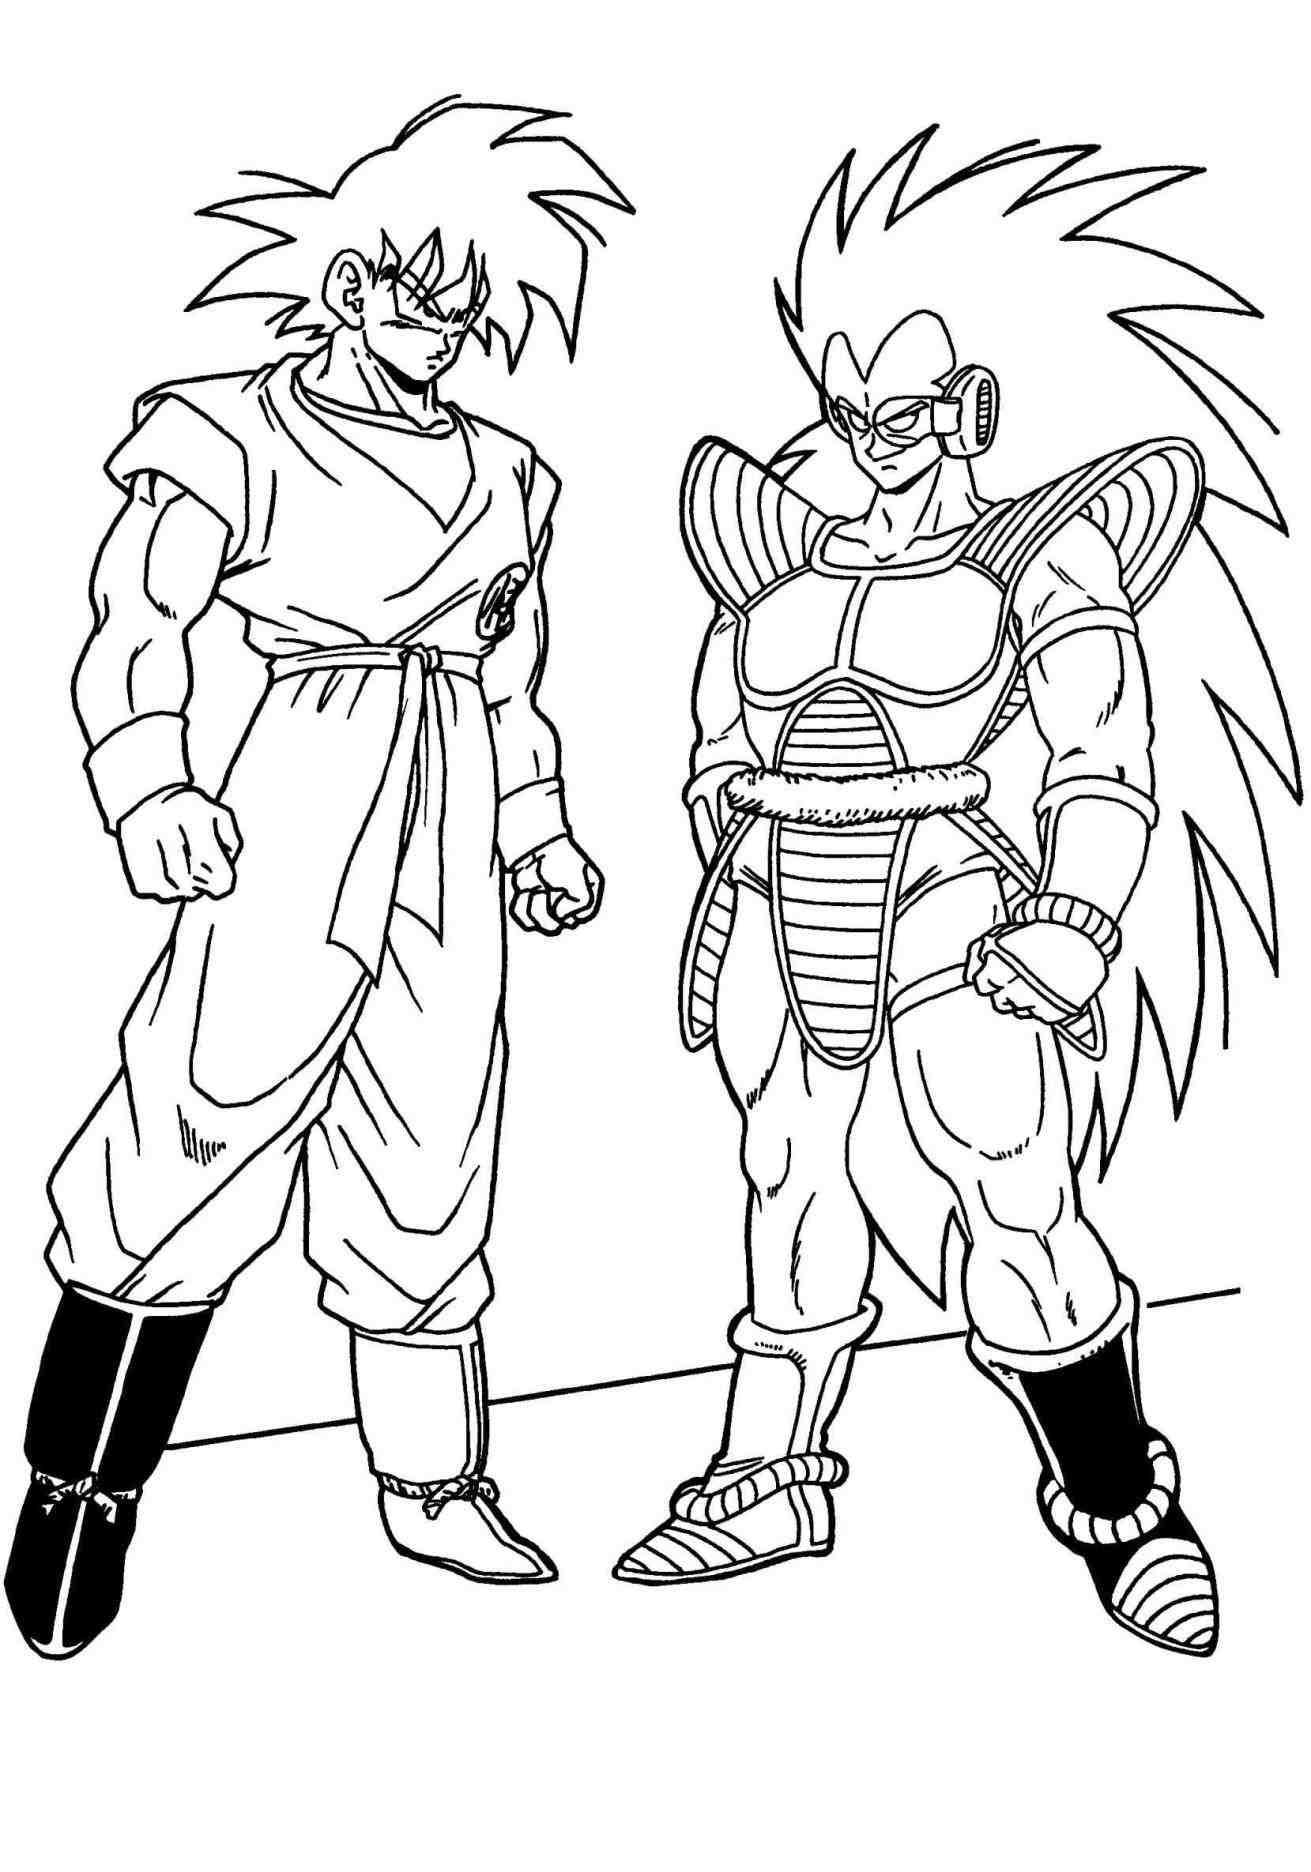 1311x1872 Saiyan 4 Drawings To Draw Gogeta Super Saiyan From Dragon Ball Gt